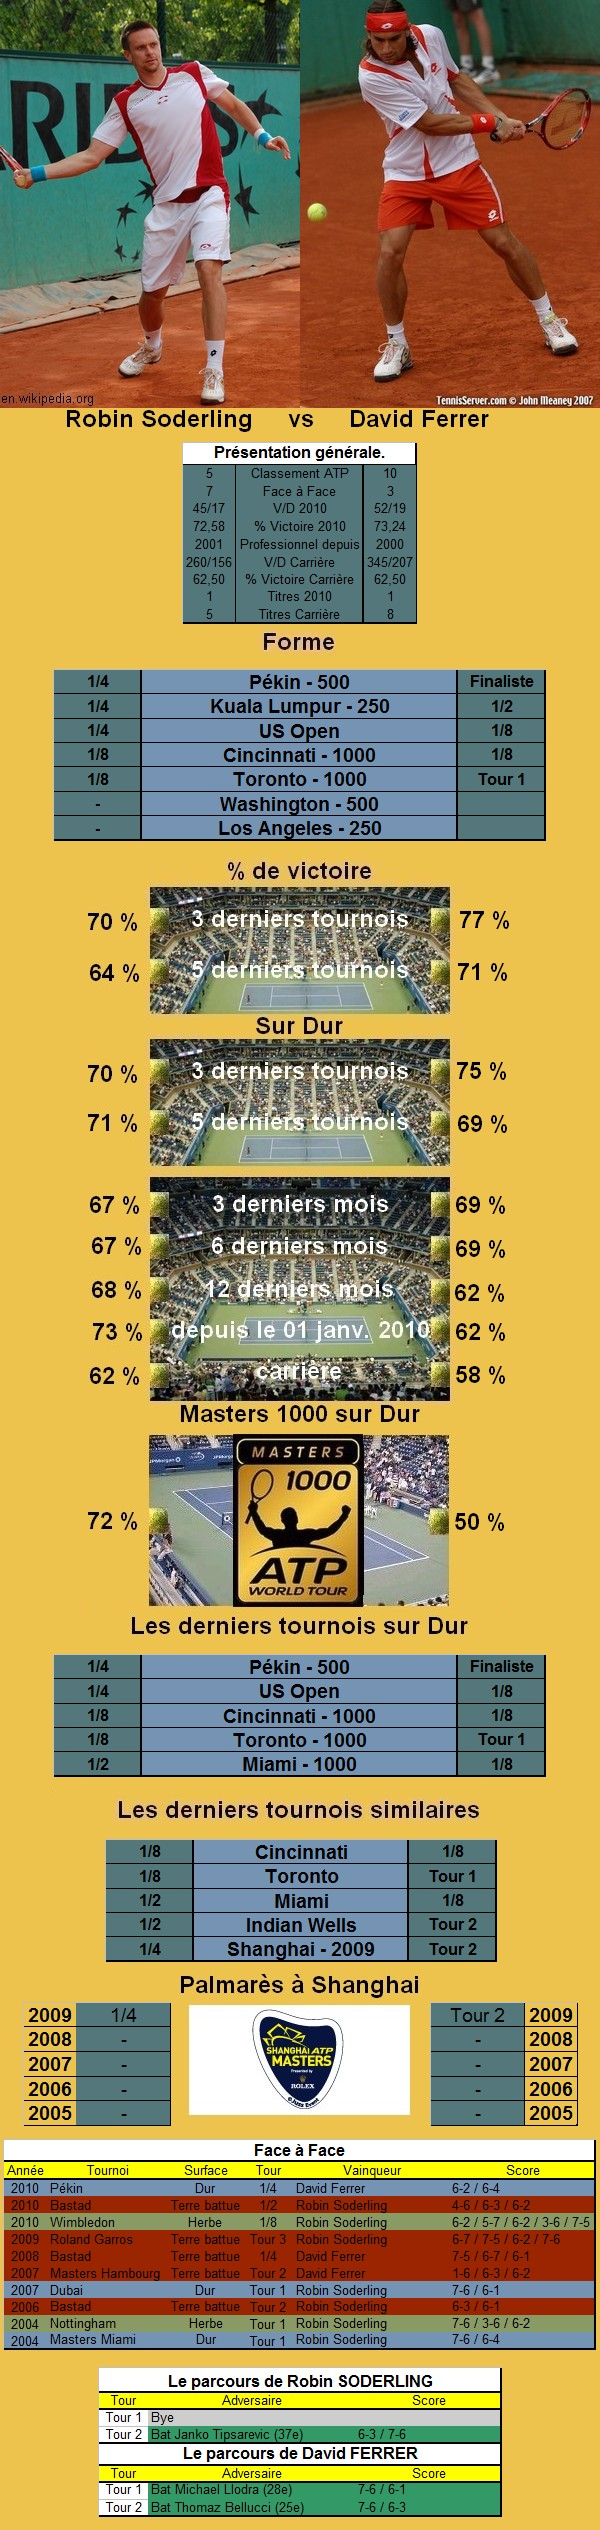 Statistiques tennis de Soderling contre Ferrer à Shanghai